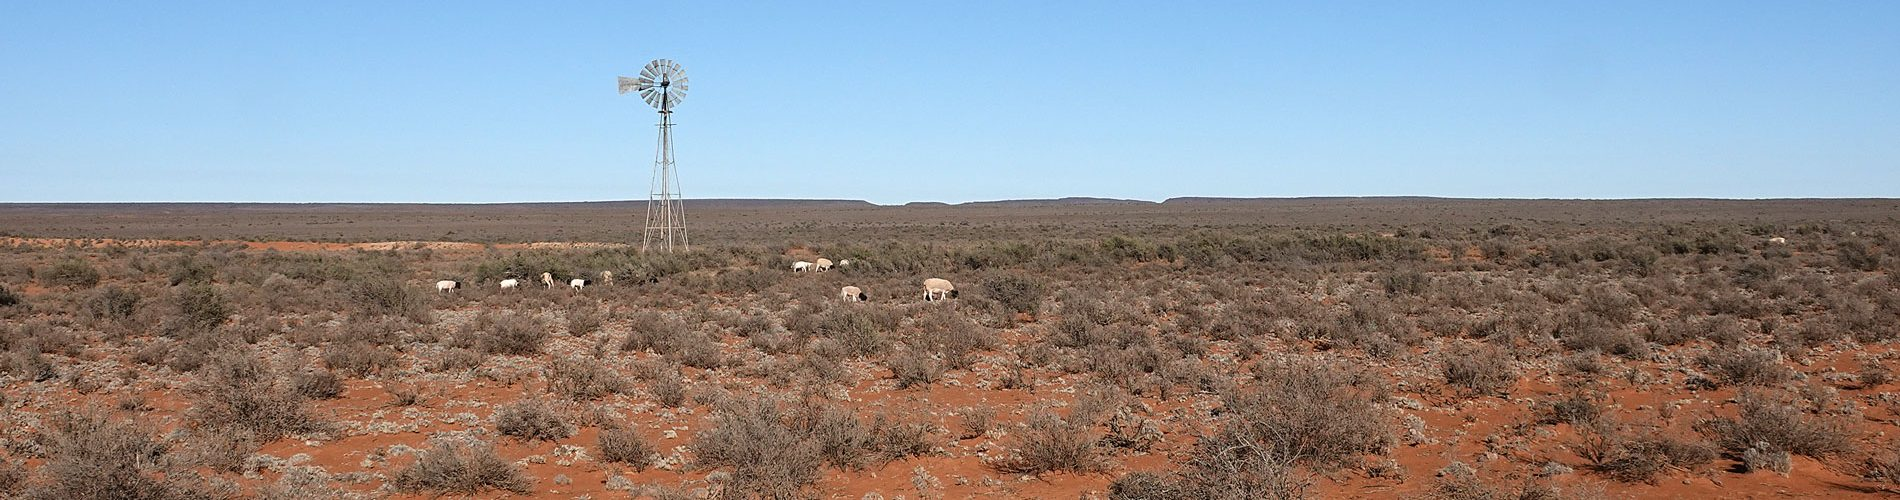 Karoo-highlands-header